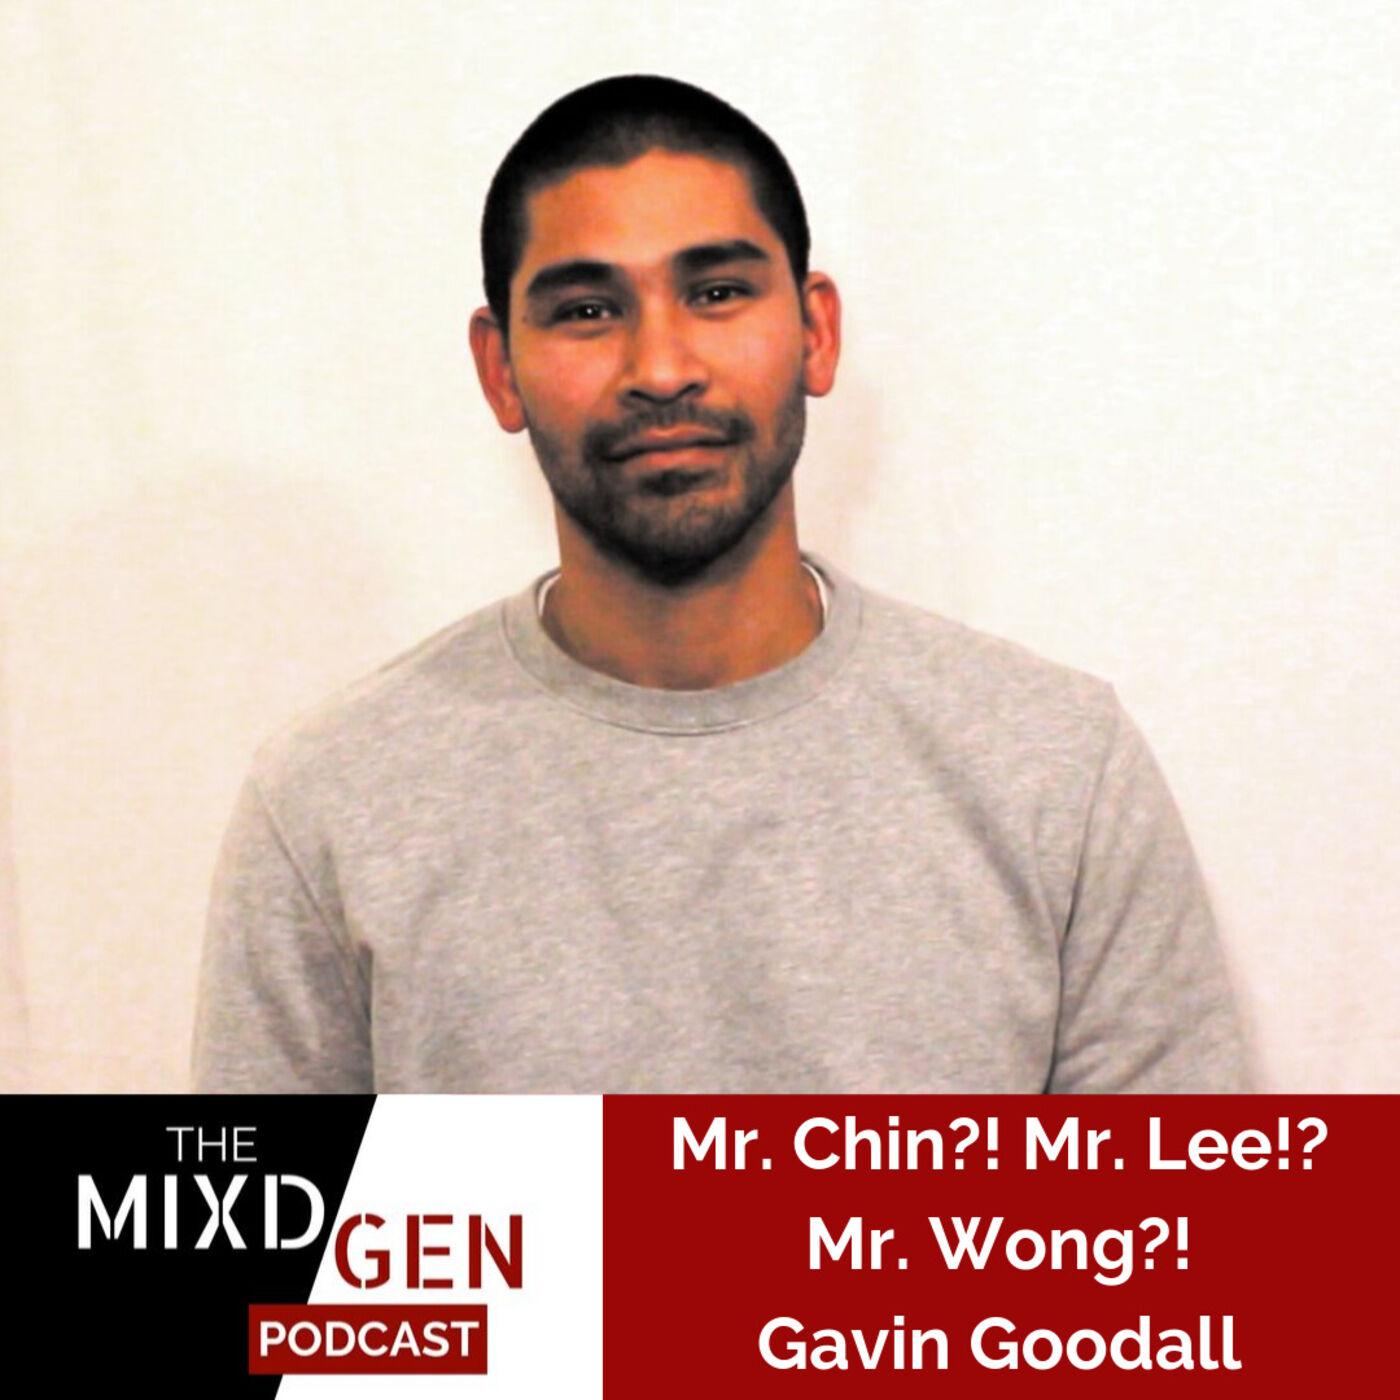 Mr. Chin!? Mr. Lee?! Mr. Wong!?: Gavin Goodall